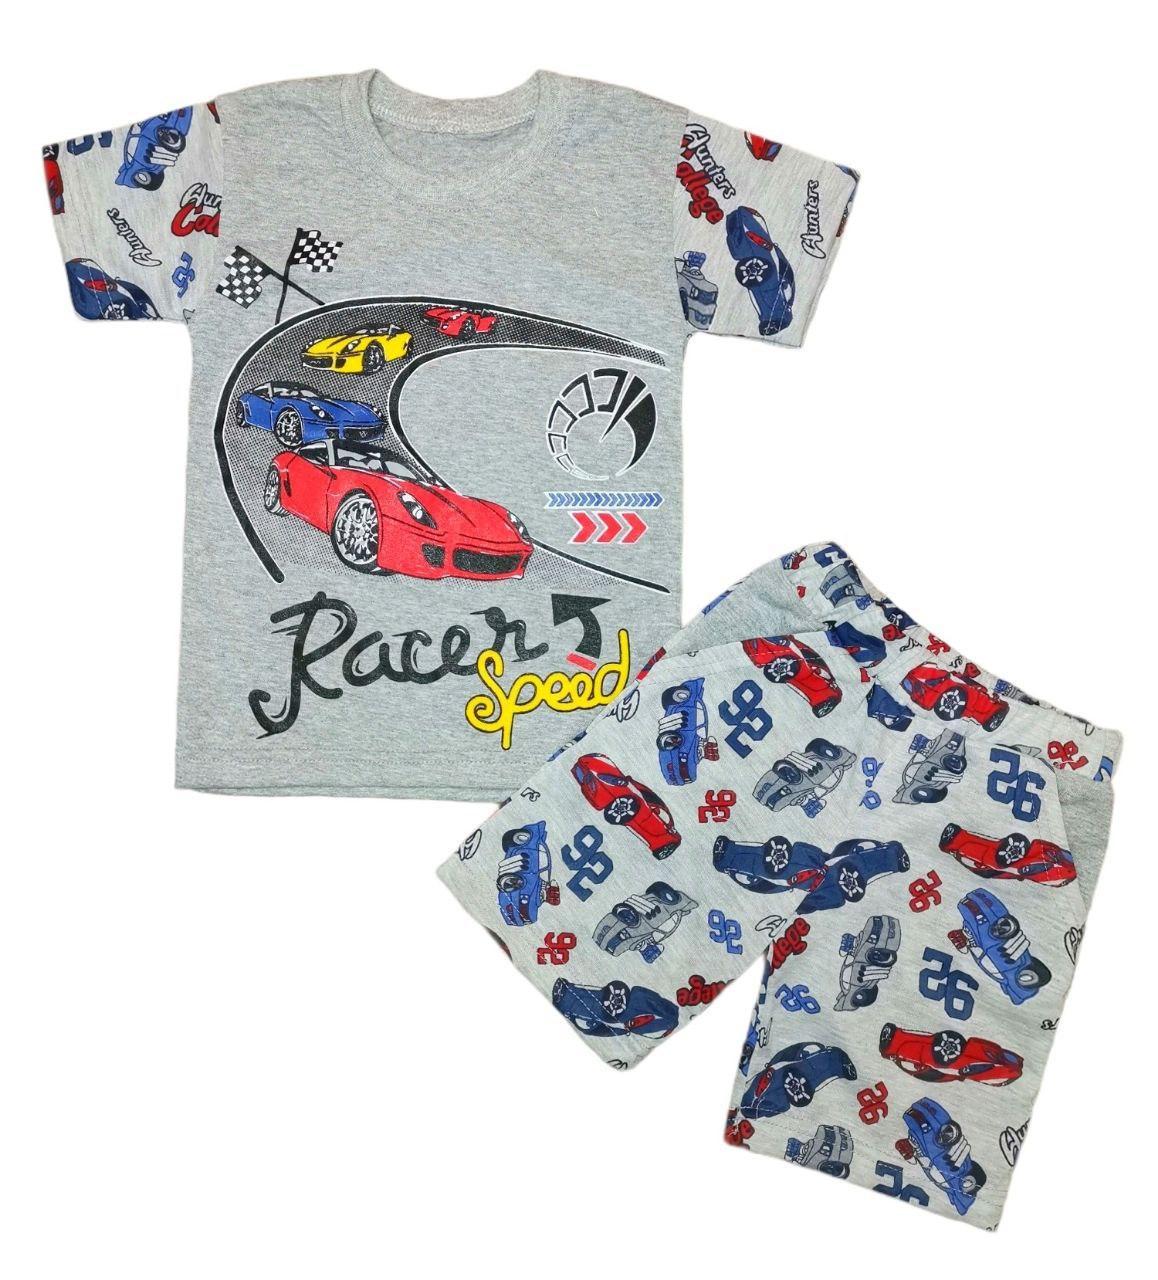 Летний комплект для мальчика футболка+шорты Racer Speed кулир